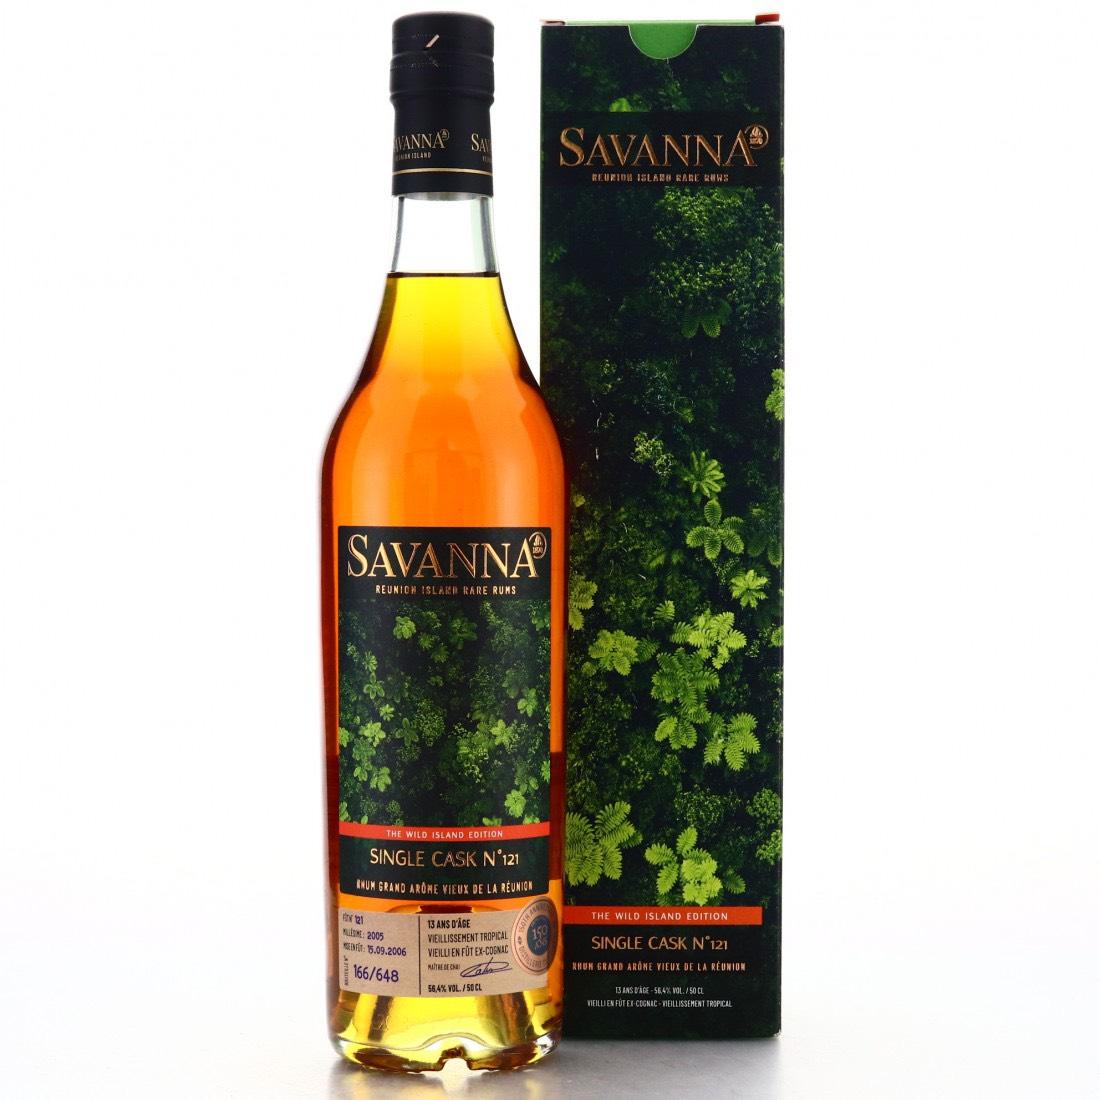 Bottle image of Savanna The Wild Island Edition - Rhum Grand Arôme Vieux